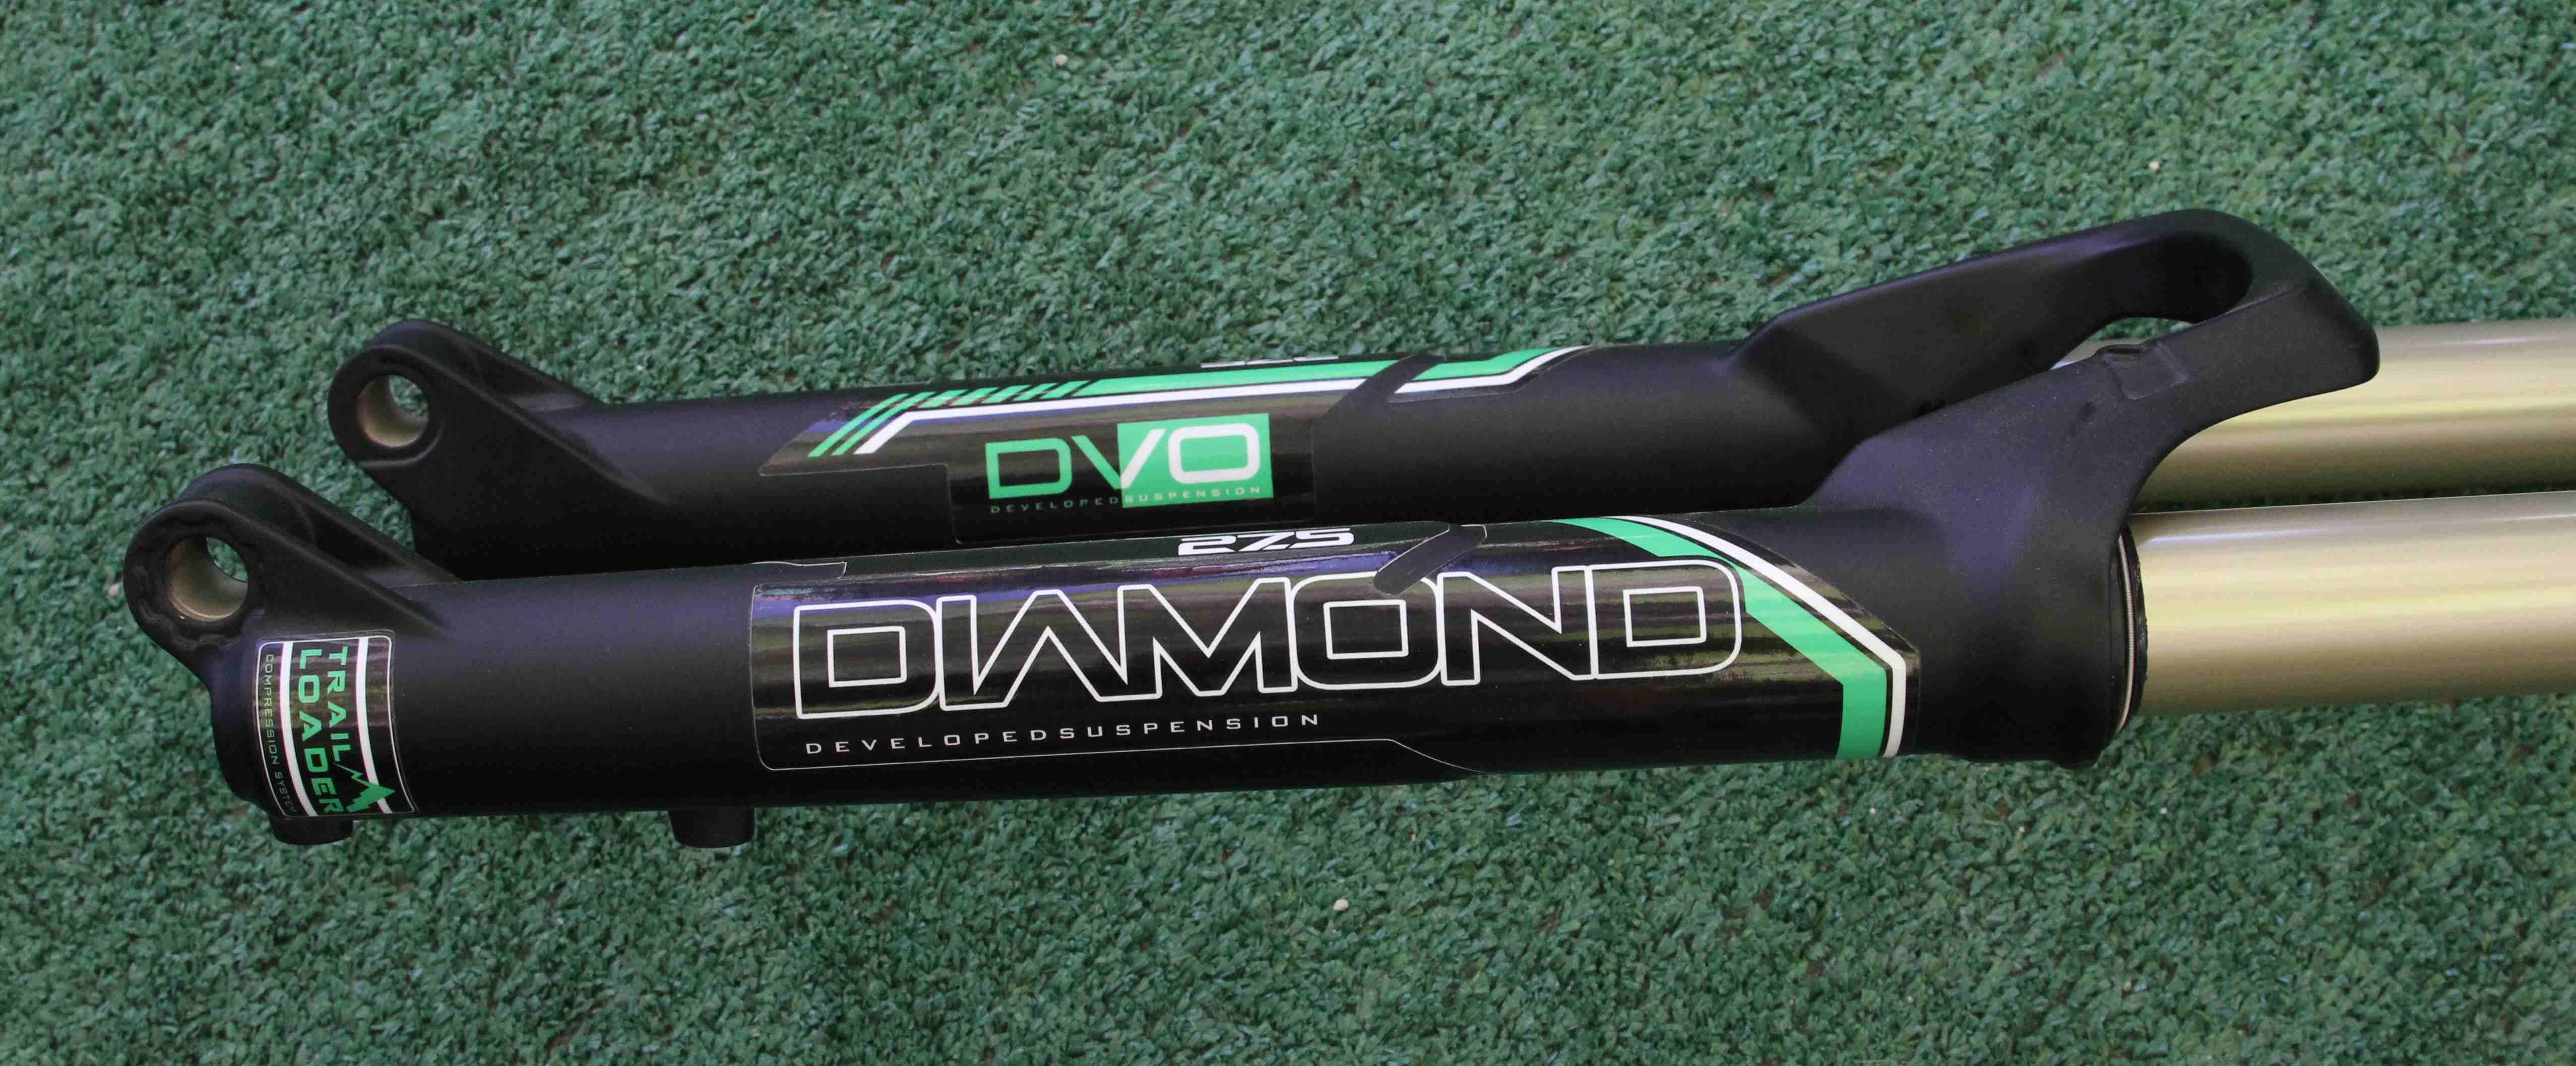 DVO-Diamond-Side-Shot